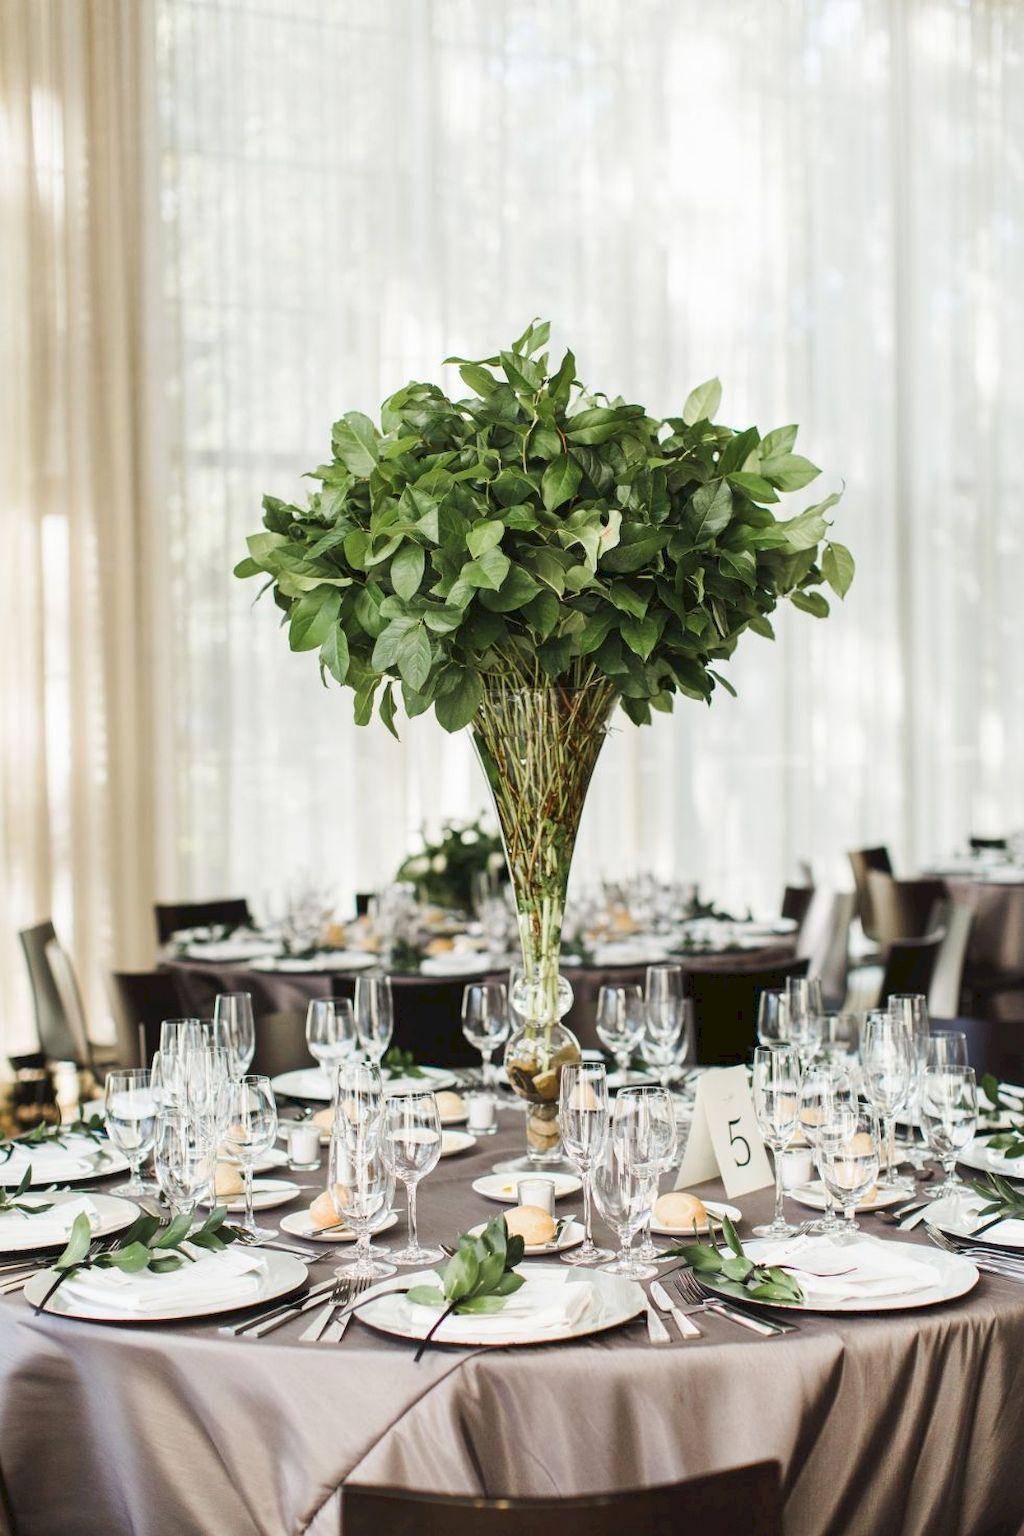 Wedding decoration ideas simple   Simple Greenery Wedding Centerpieces Ideas